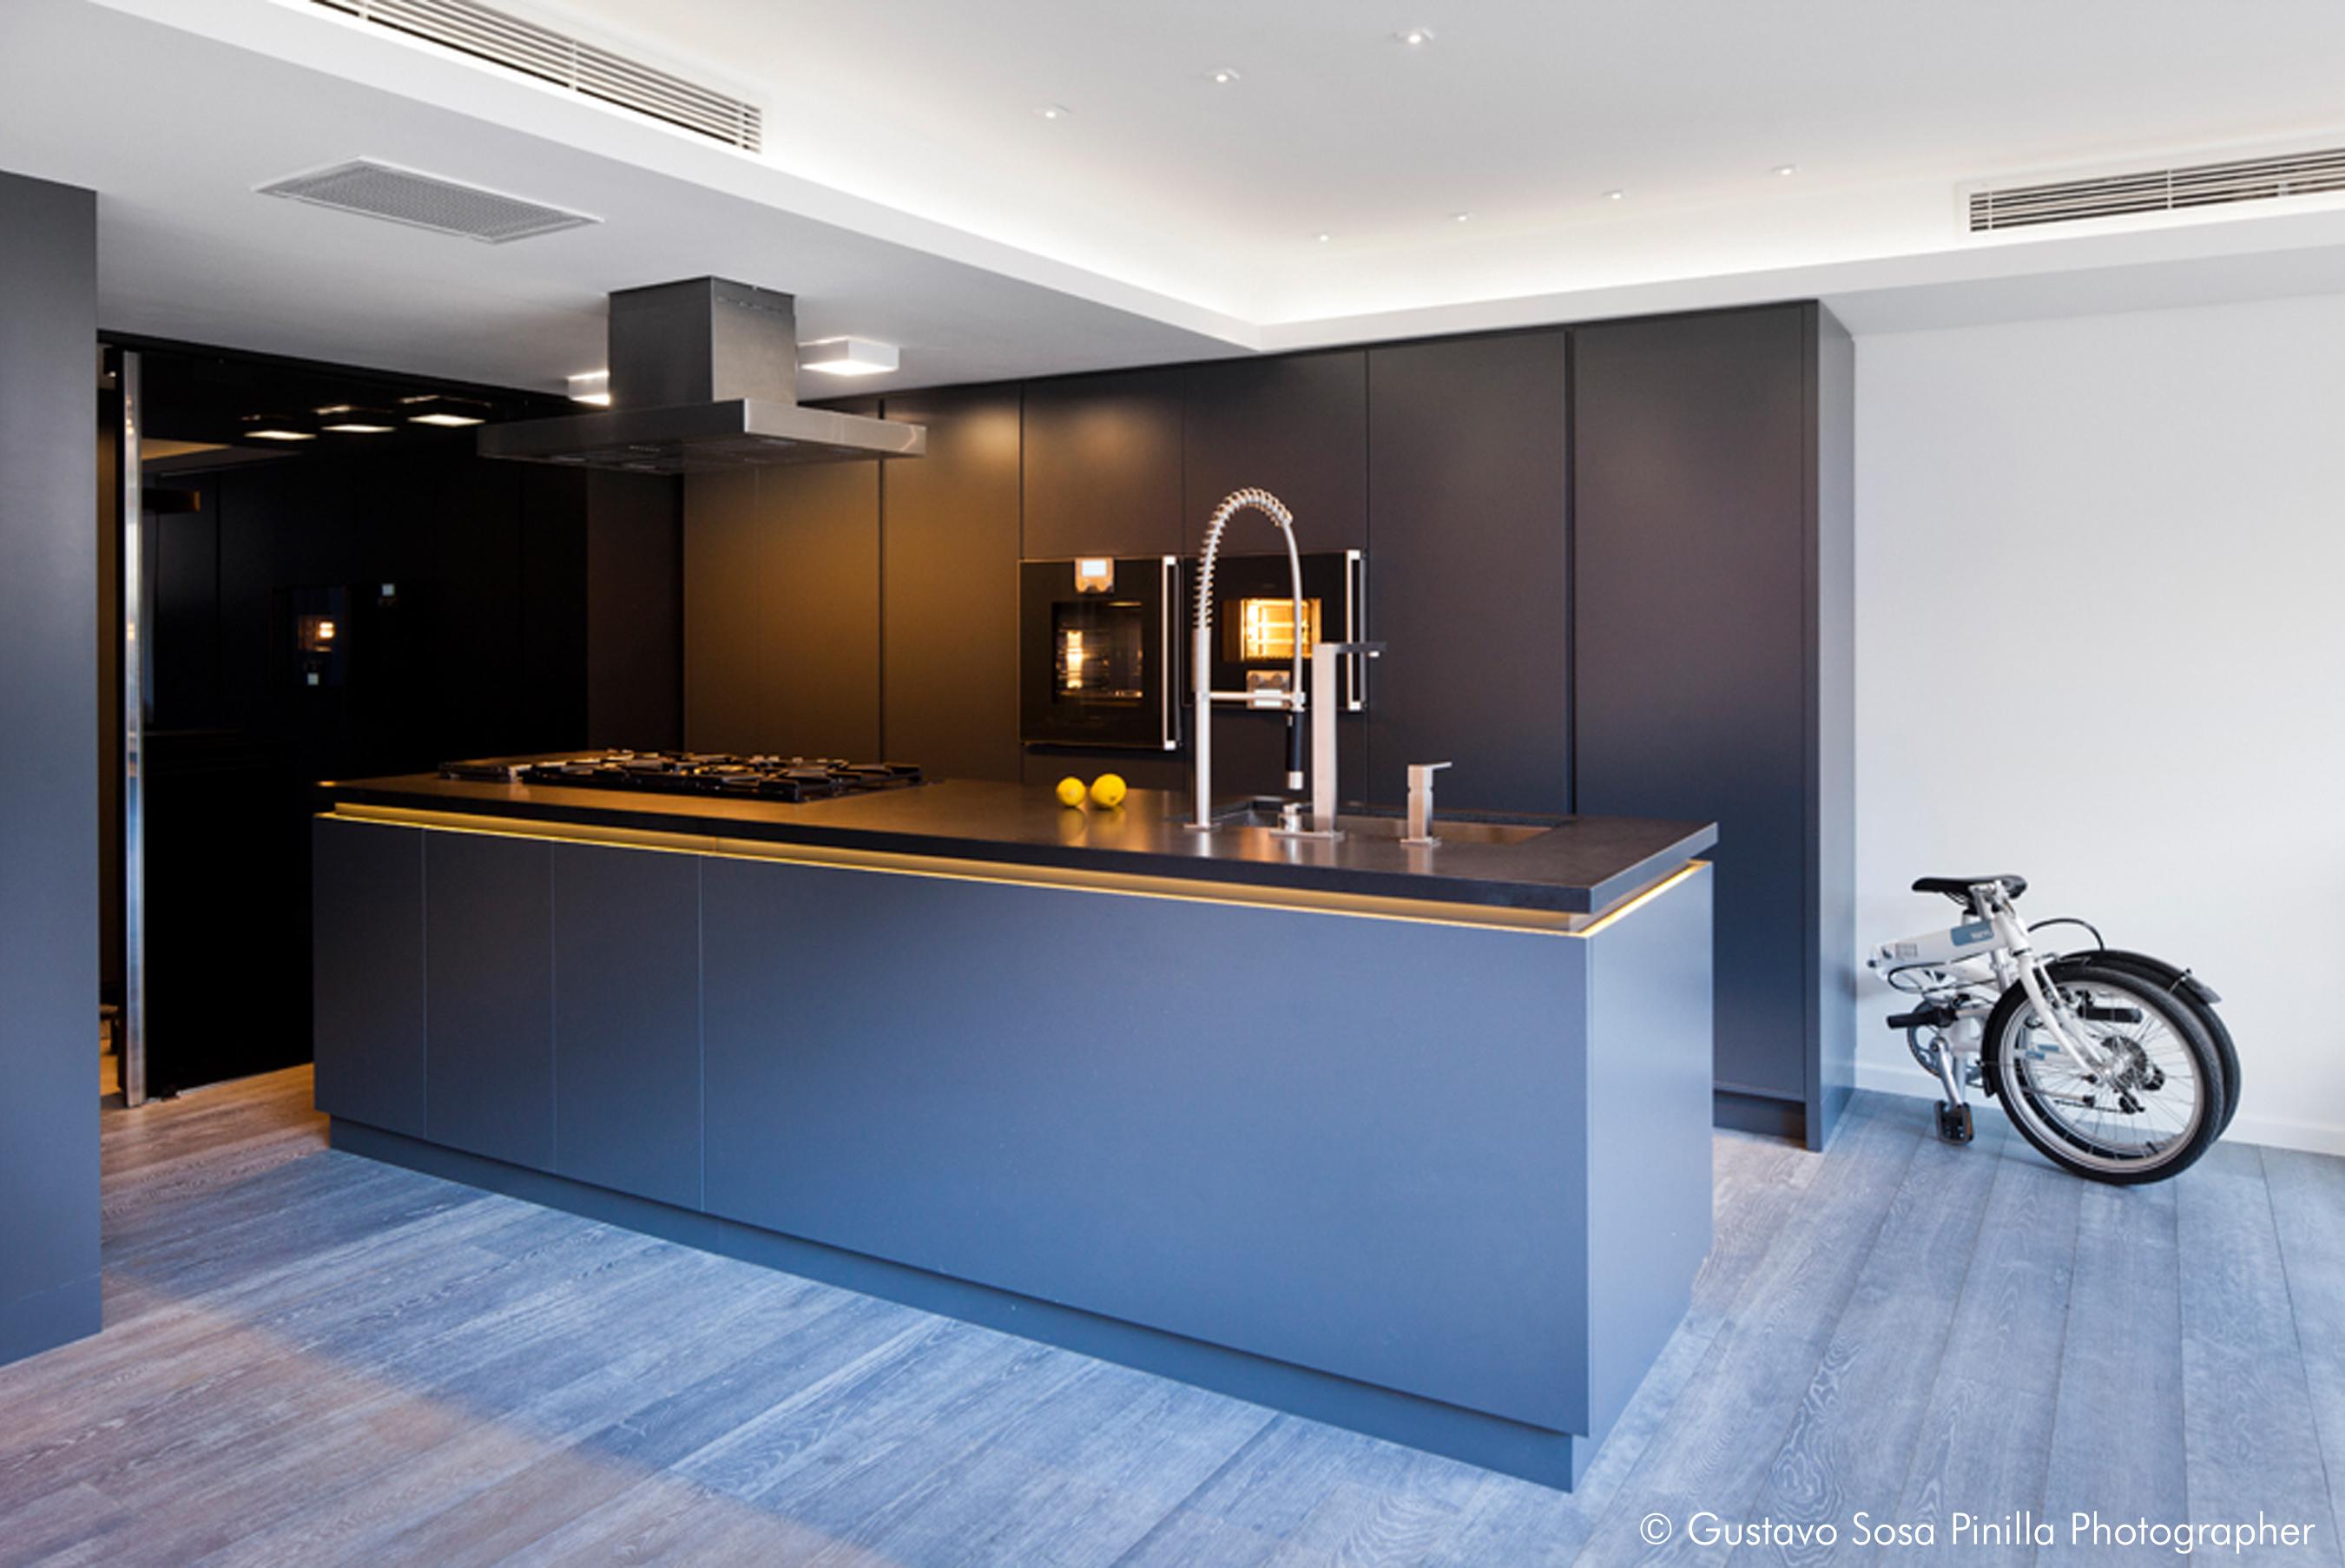 Kitchen Area - wood floor - Gascon Remy Architect